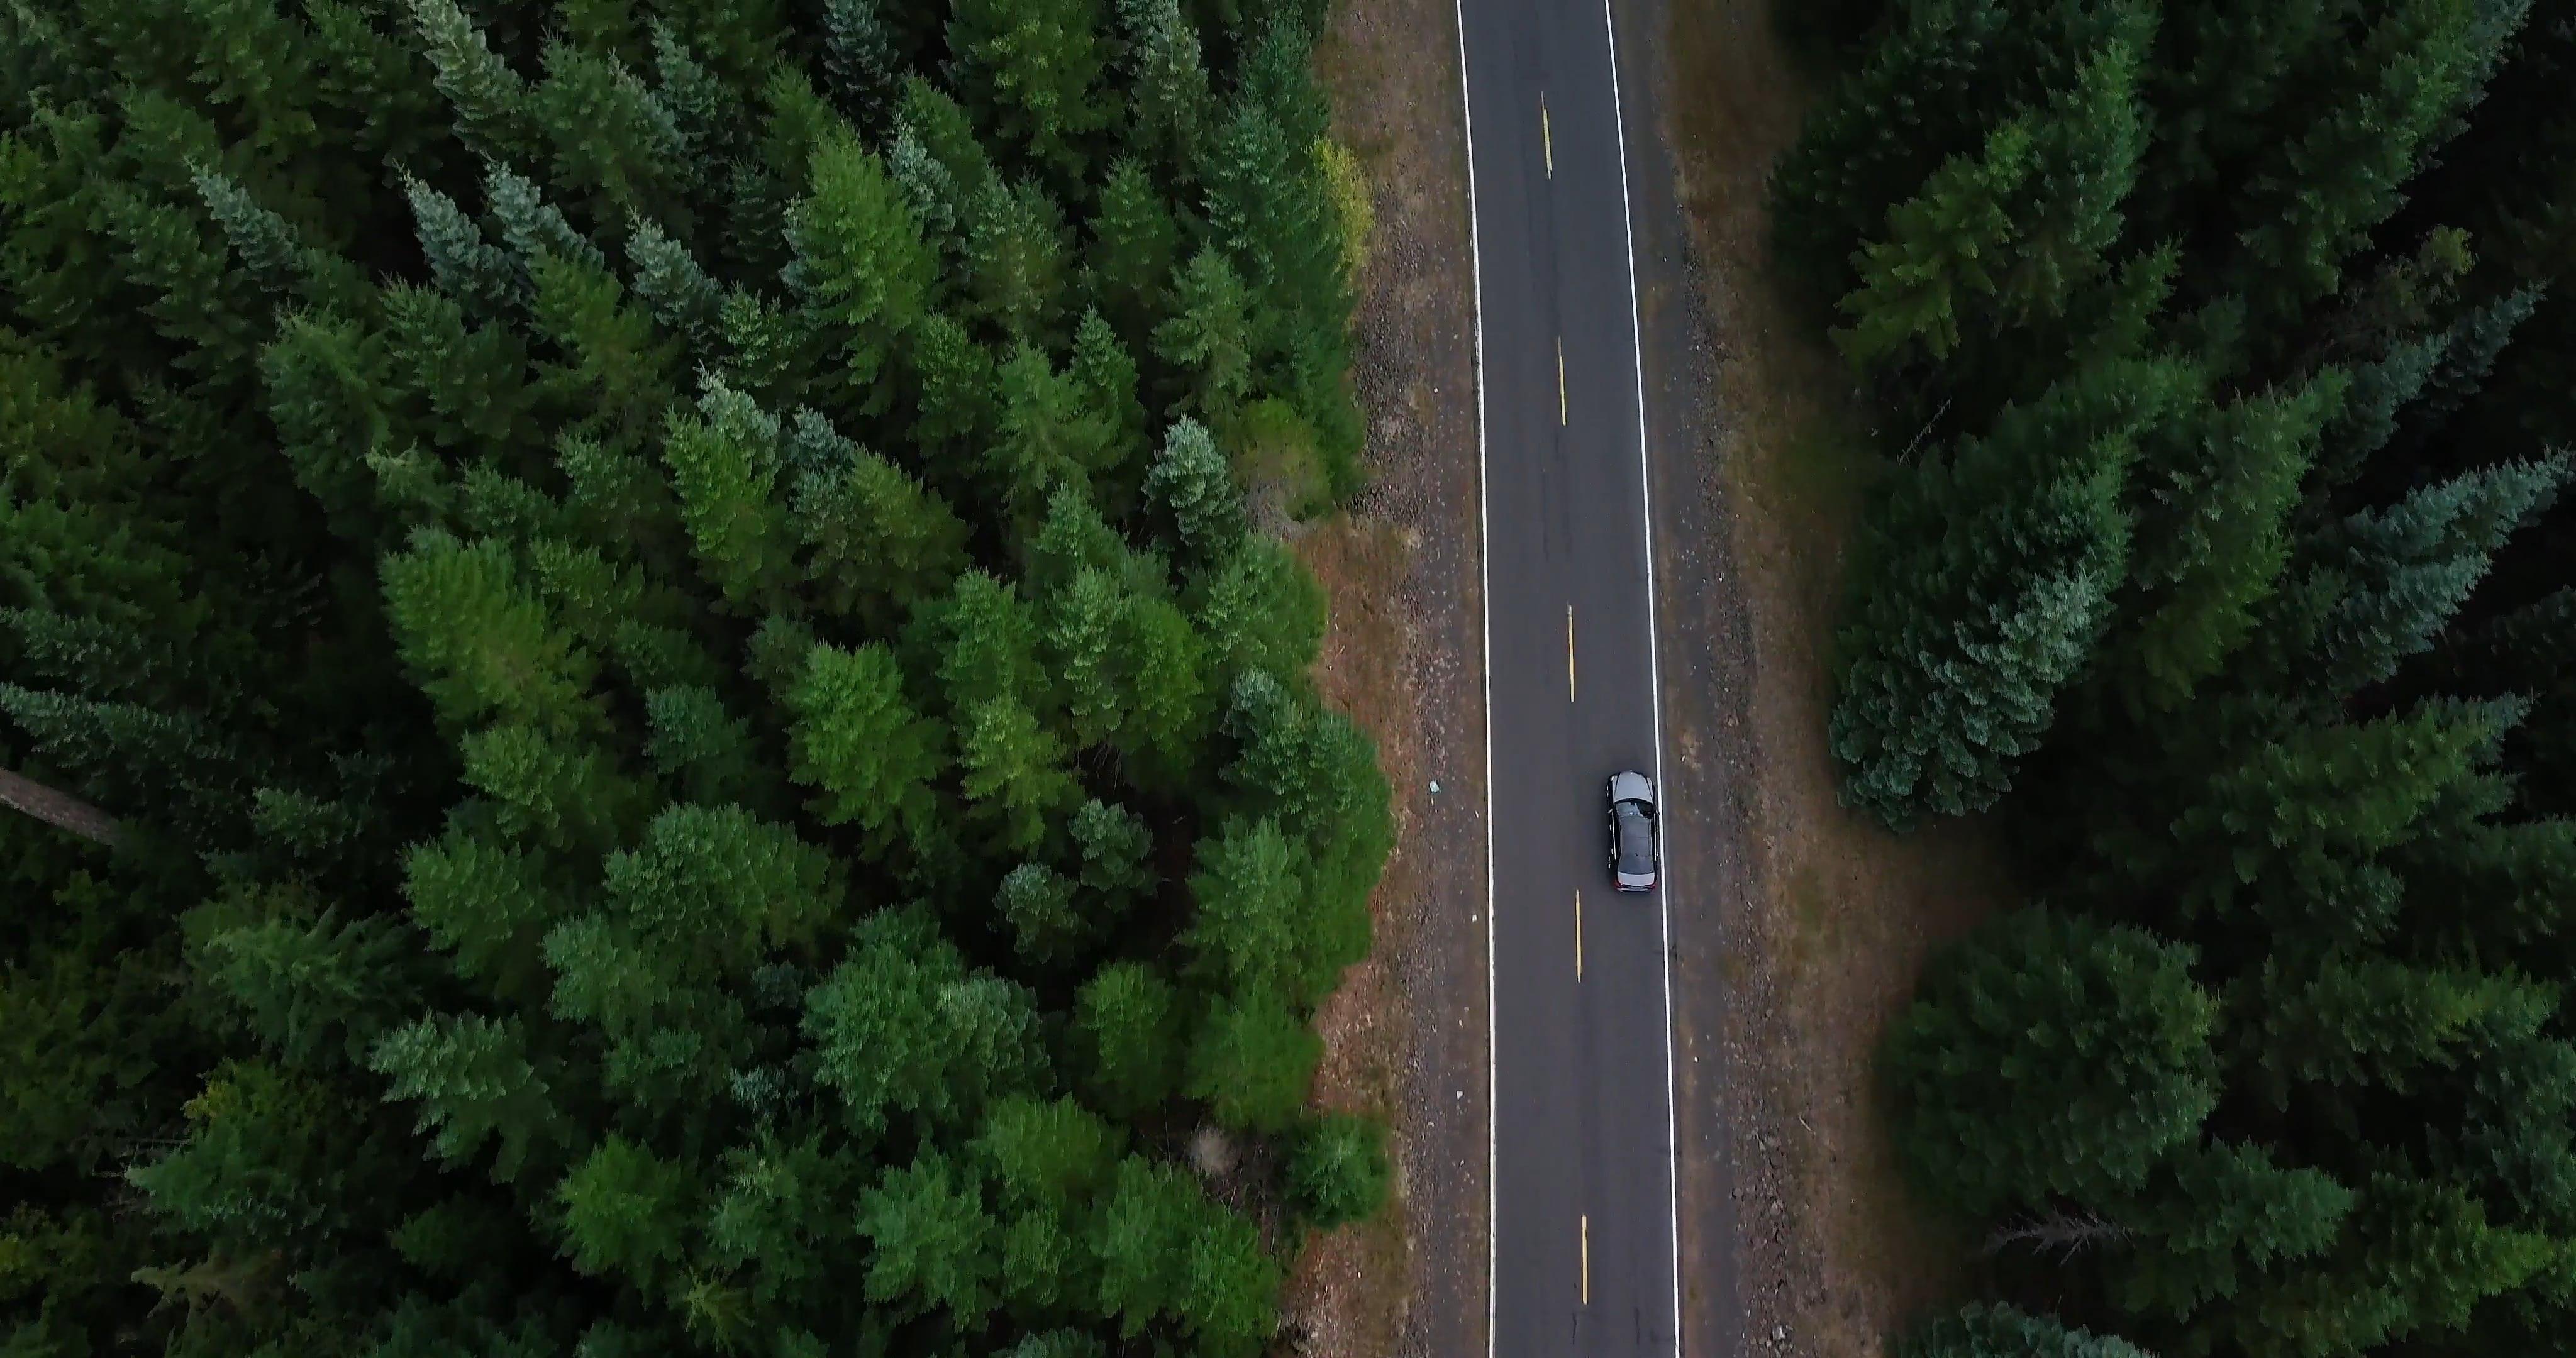 1000 Amazing Road Videos Pexels Free Stock Videos